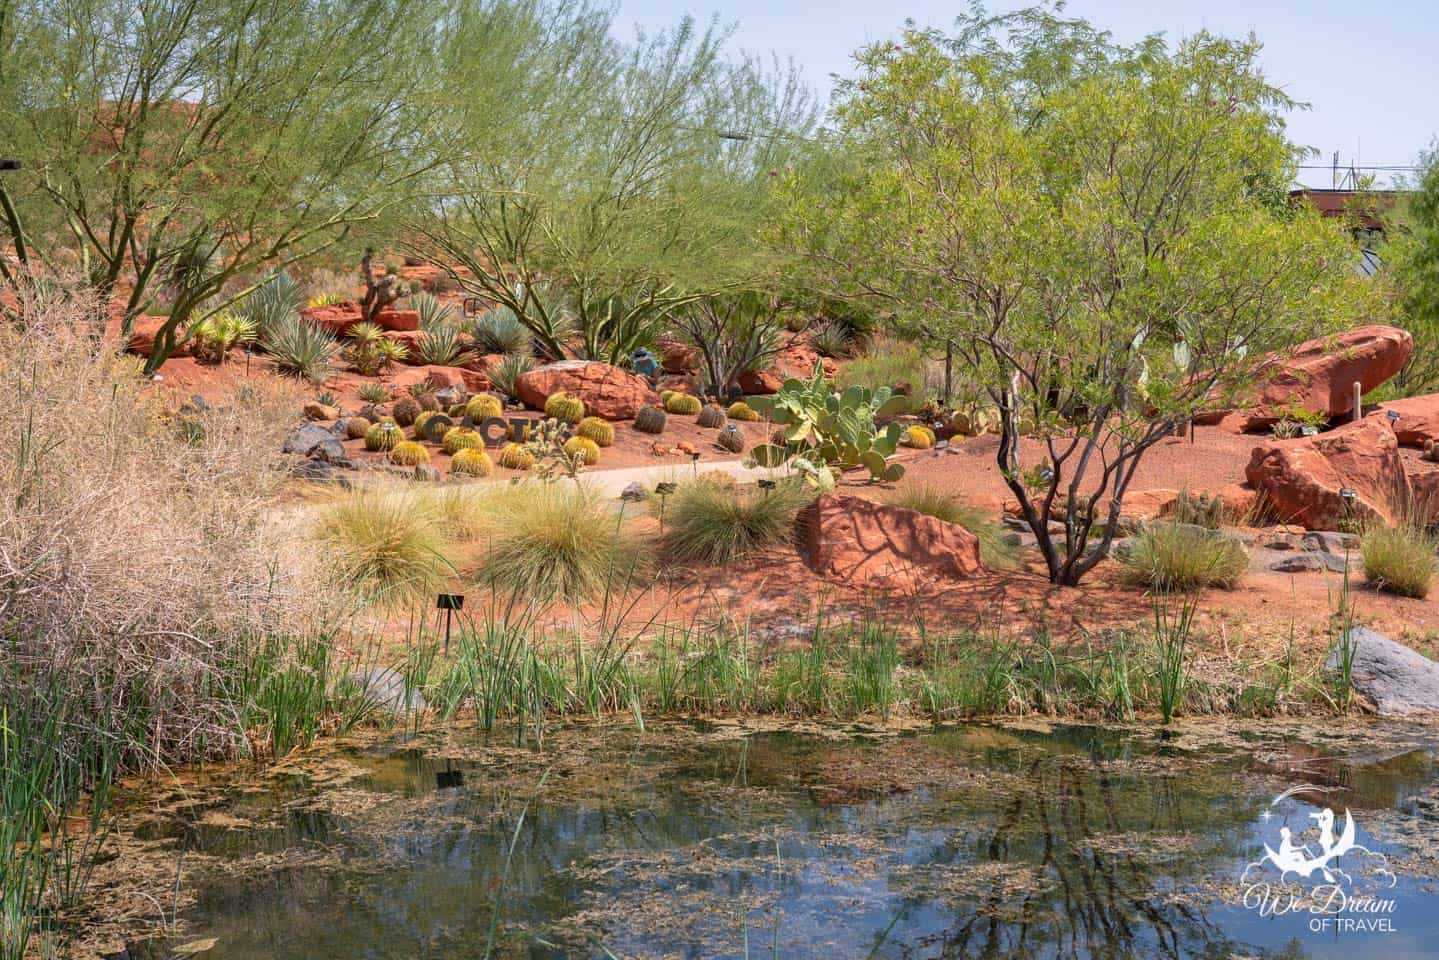 Landscape photography of the Red Hills Desert Garden in St George, UT.